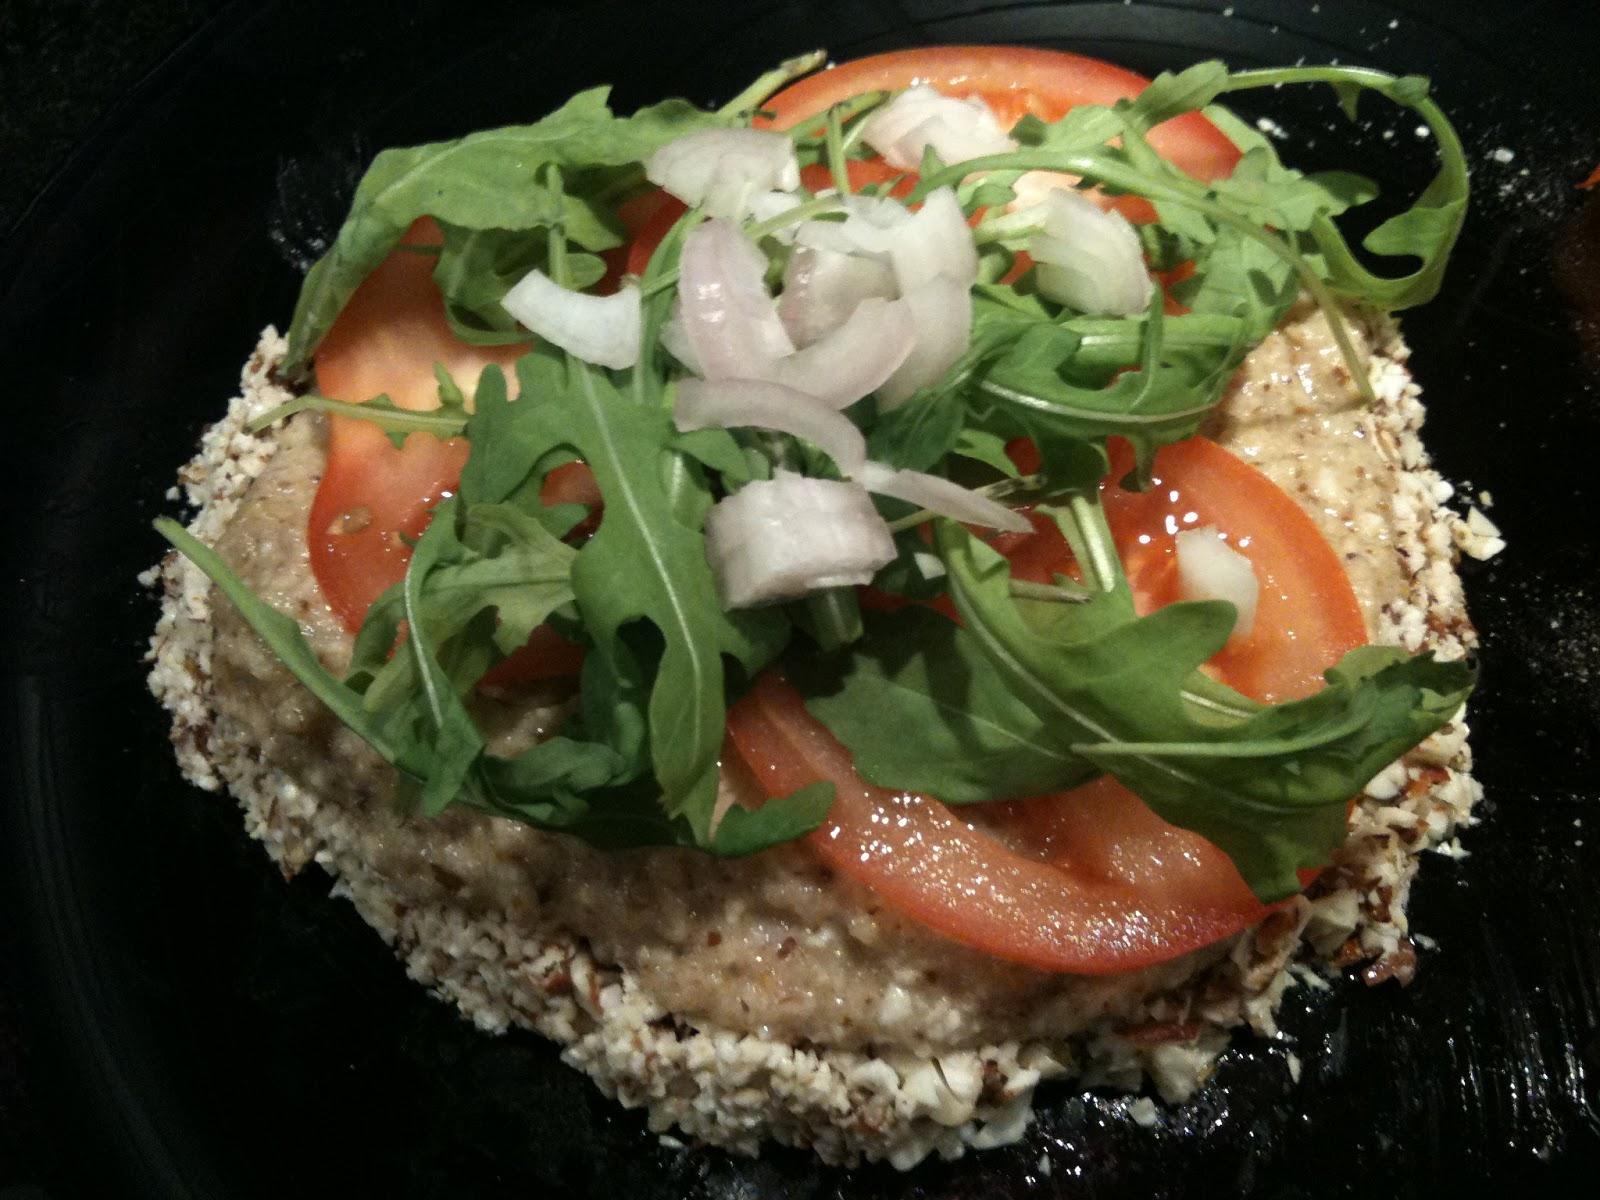 enkla raw food recept